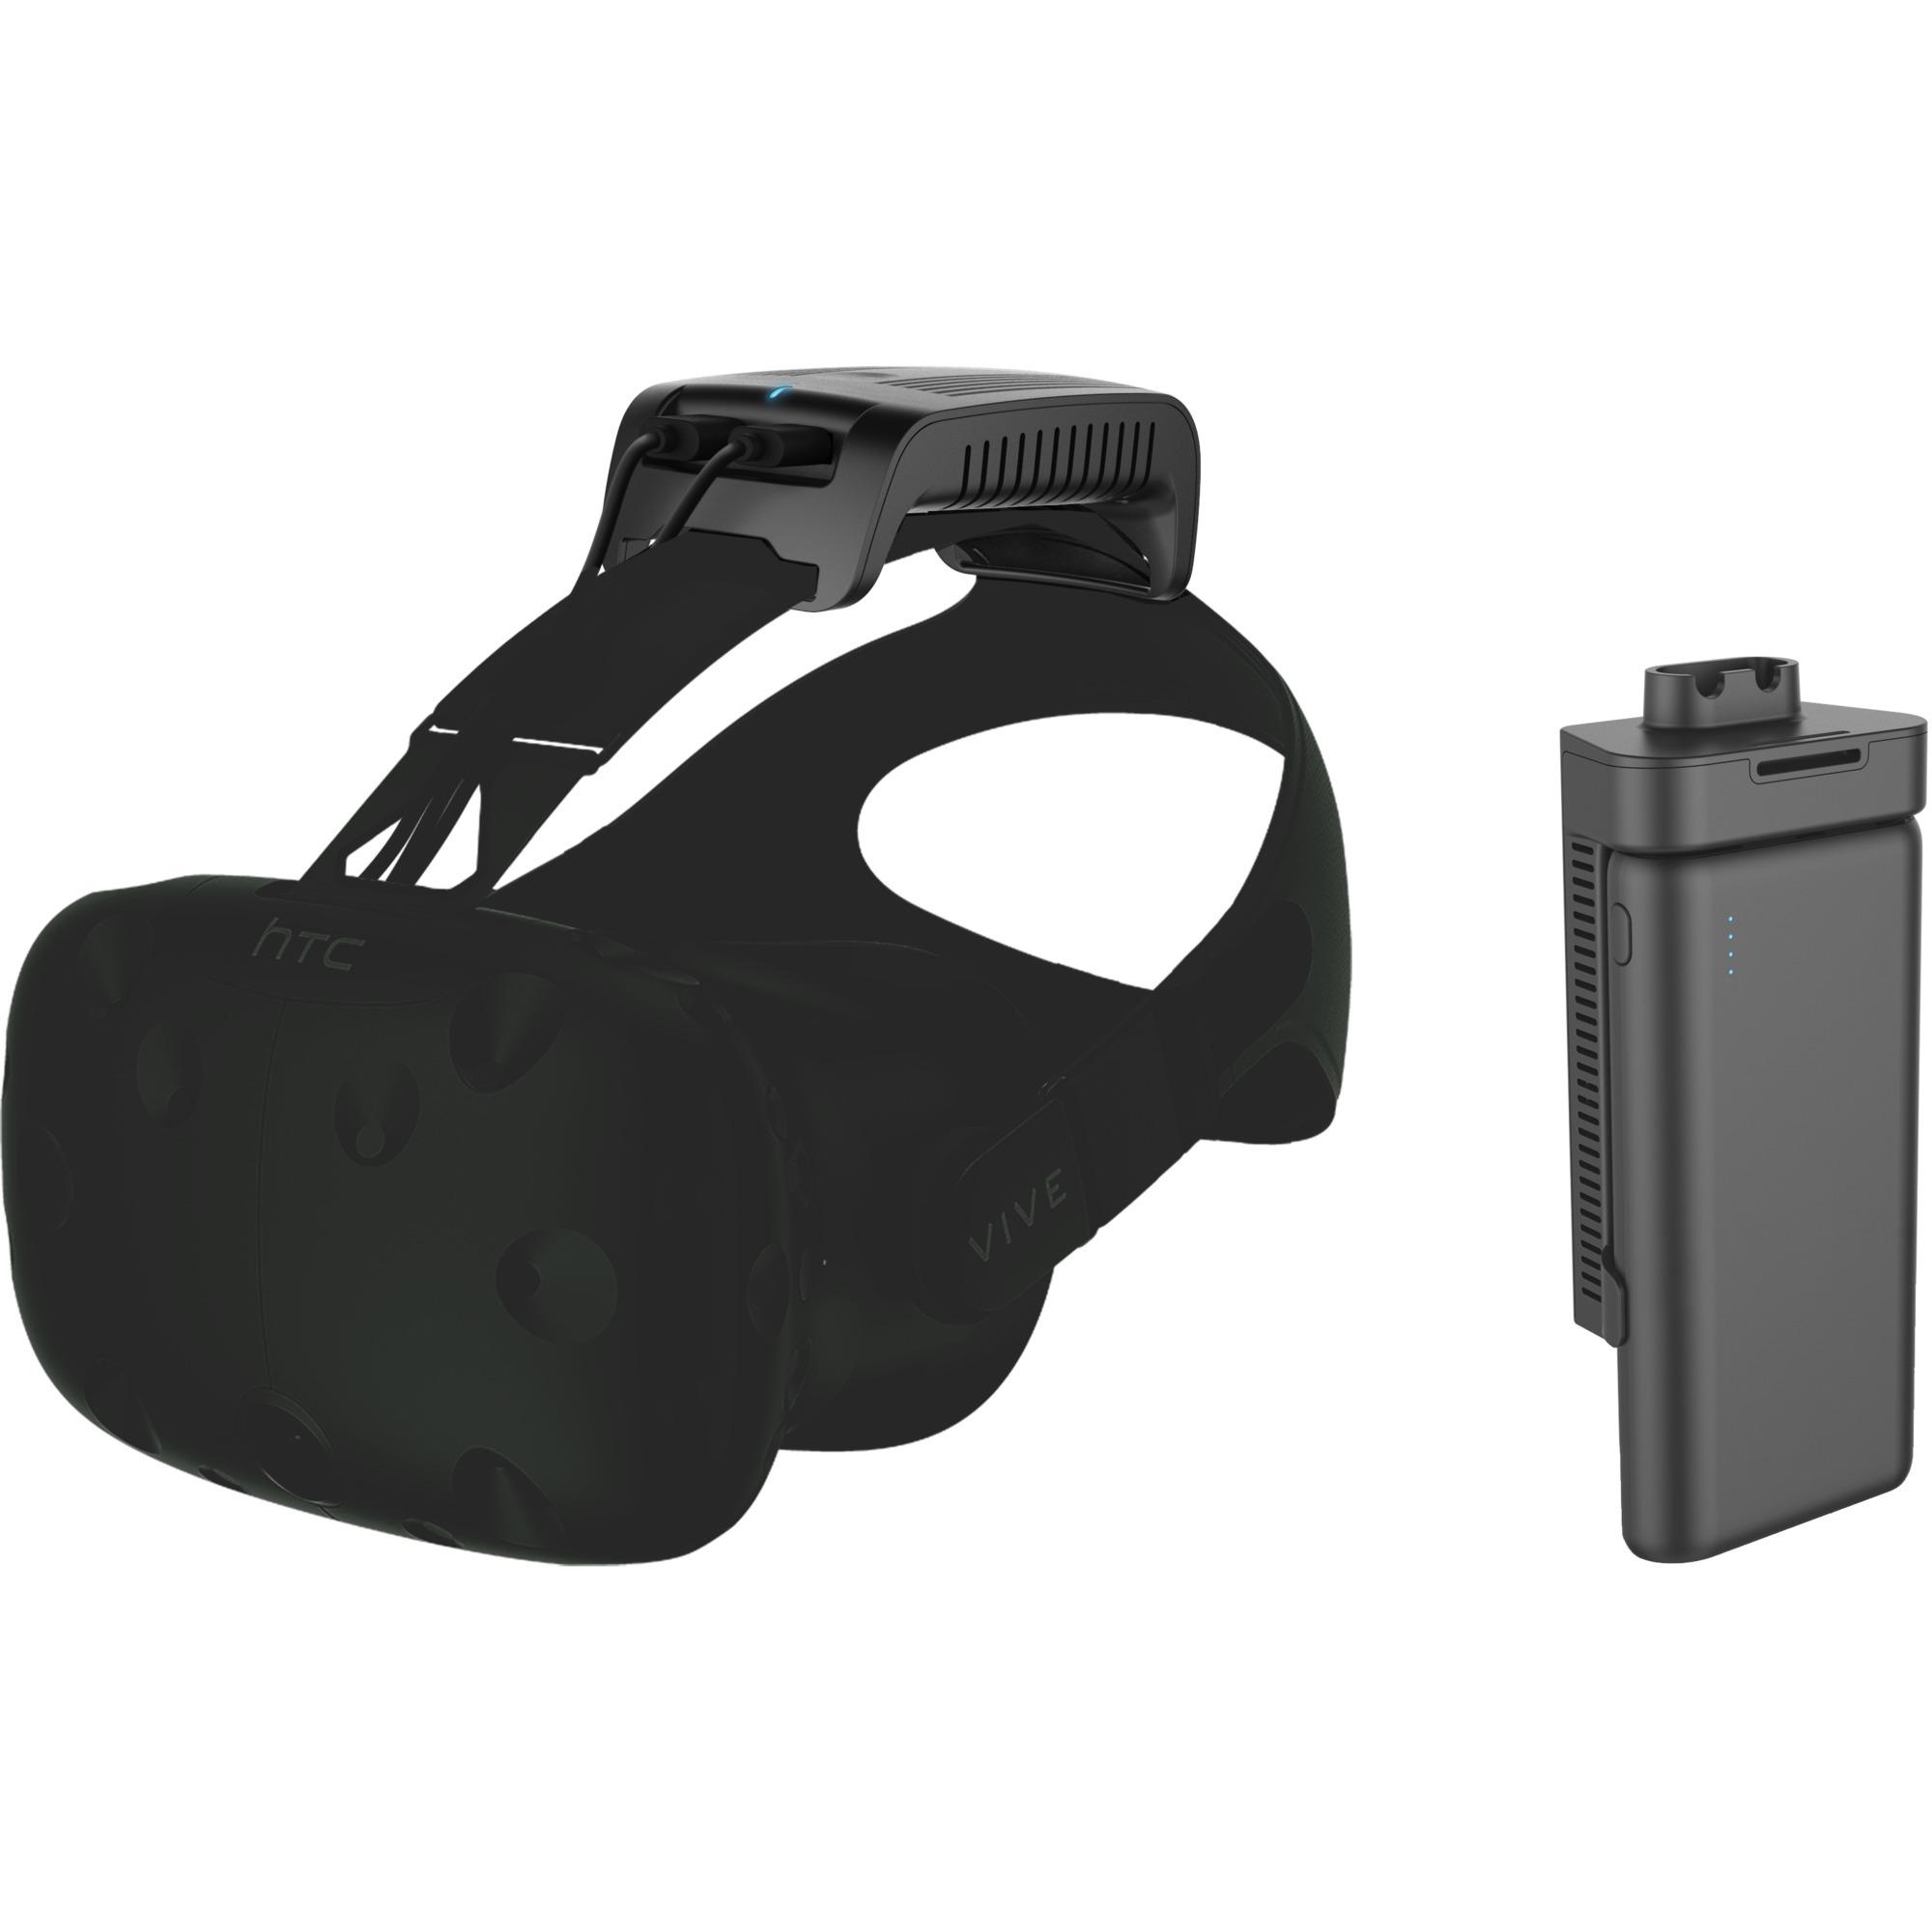 Wireless Adapter HTC Vive, Adaptador